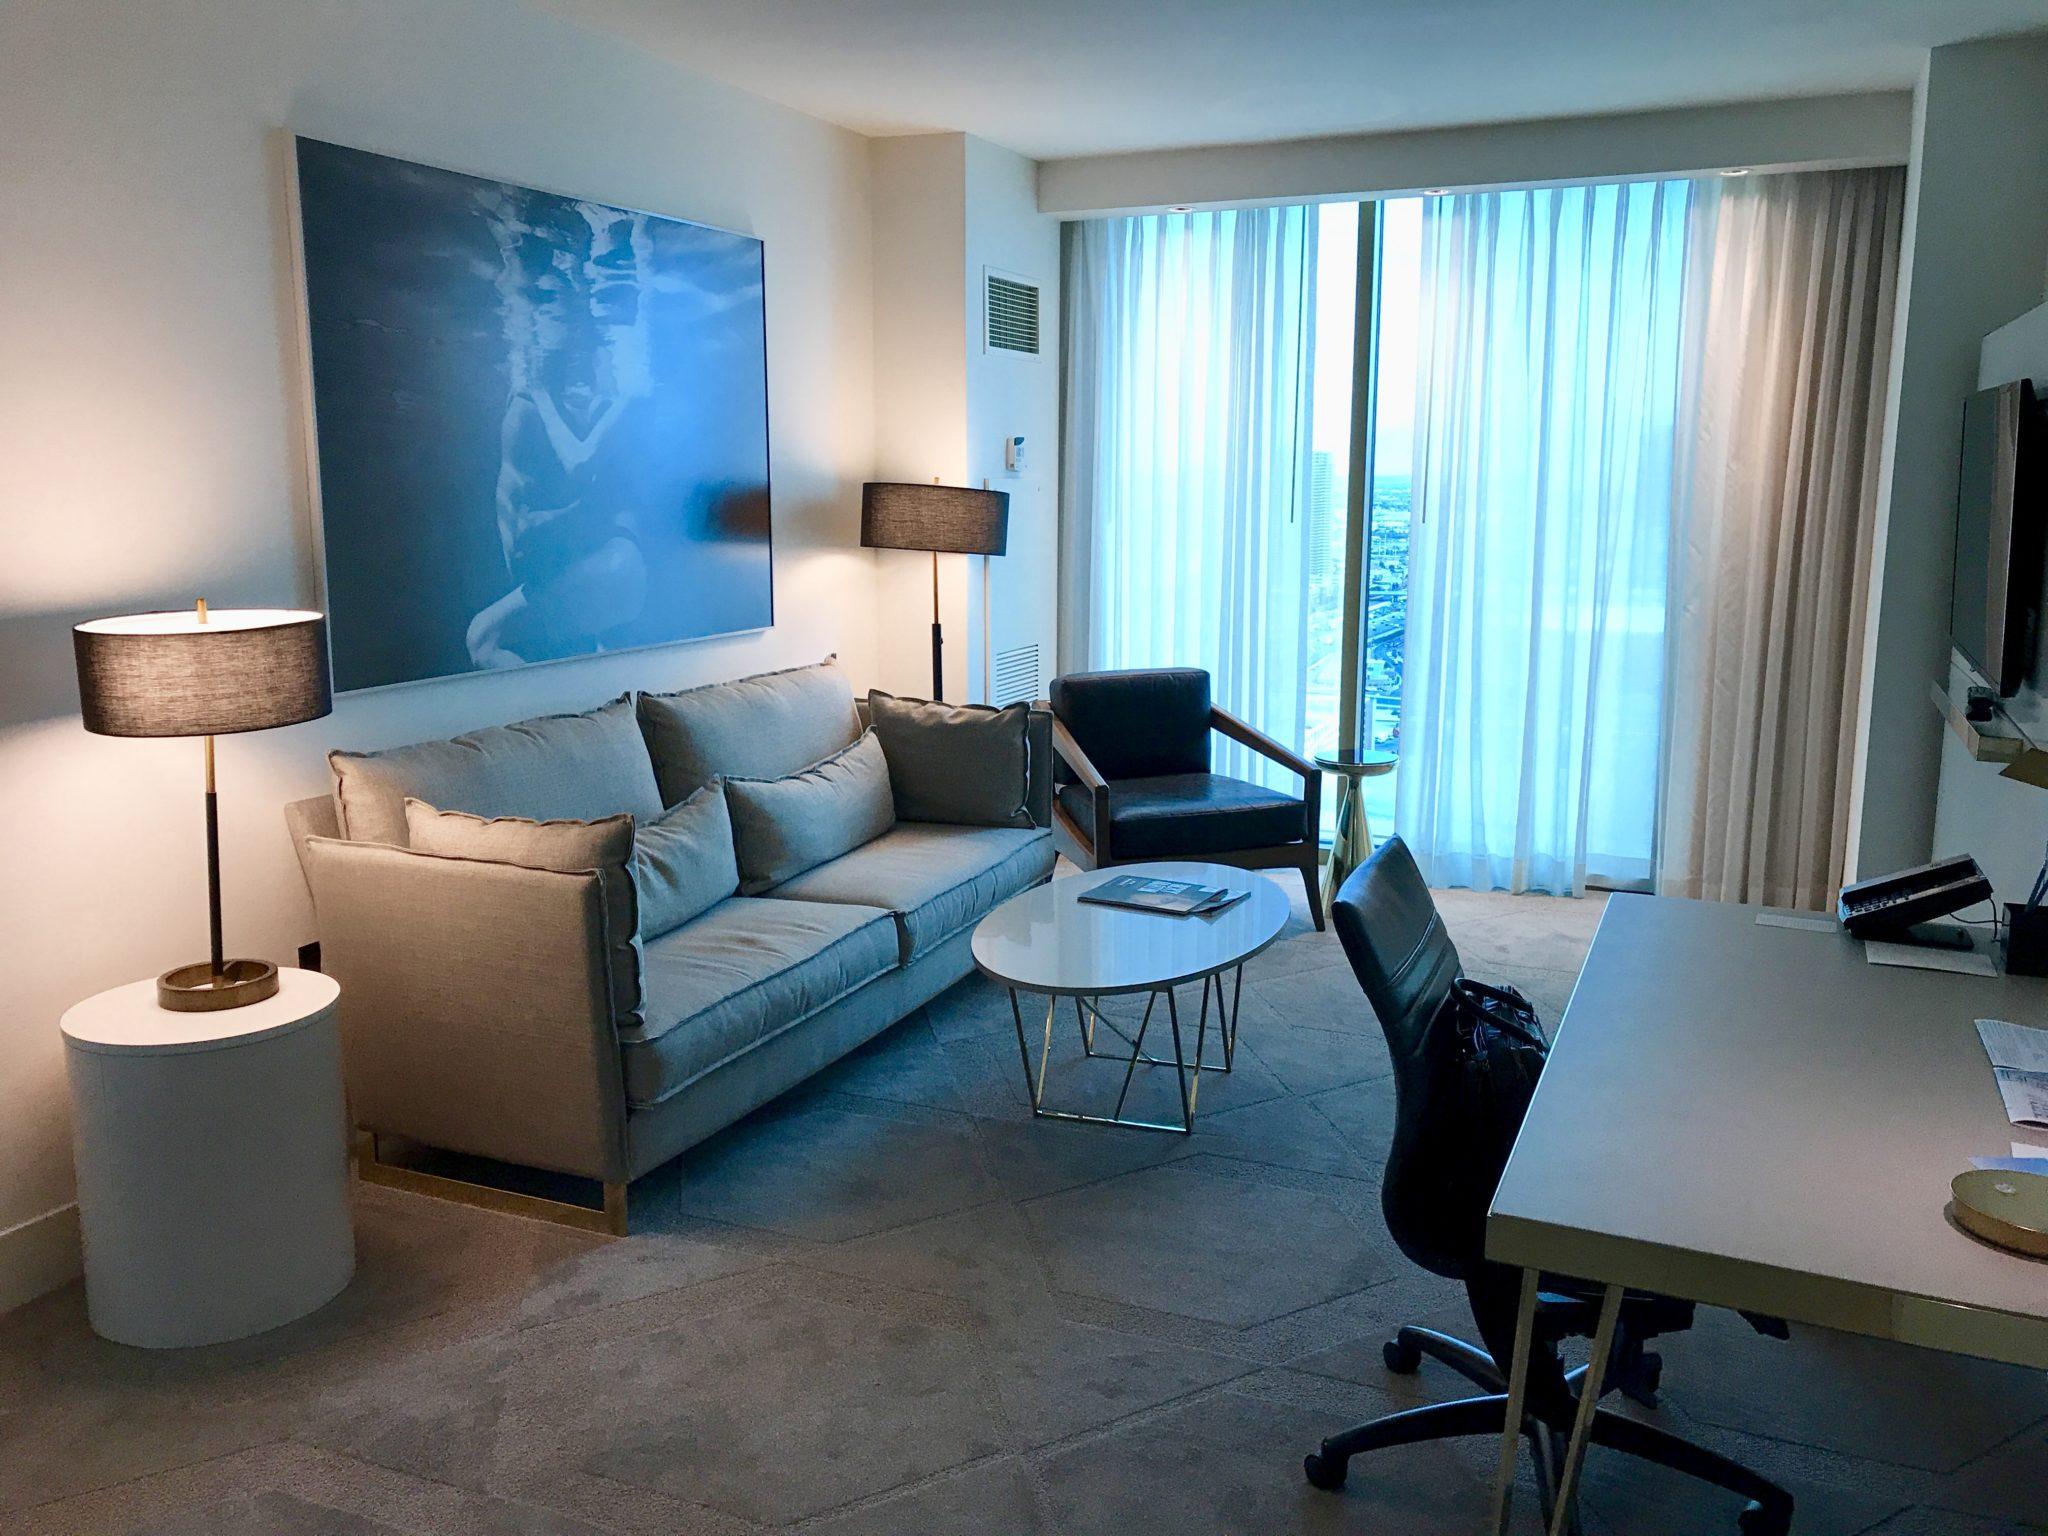 Hotel review delano hotel las vegas is a great experience - Delano las vegas two bedroom suite ...